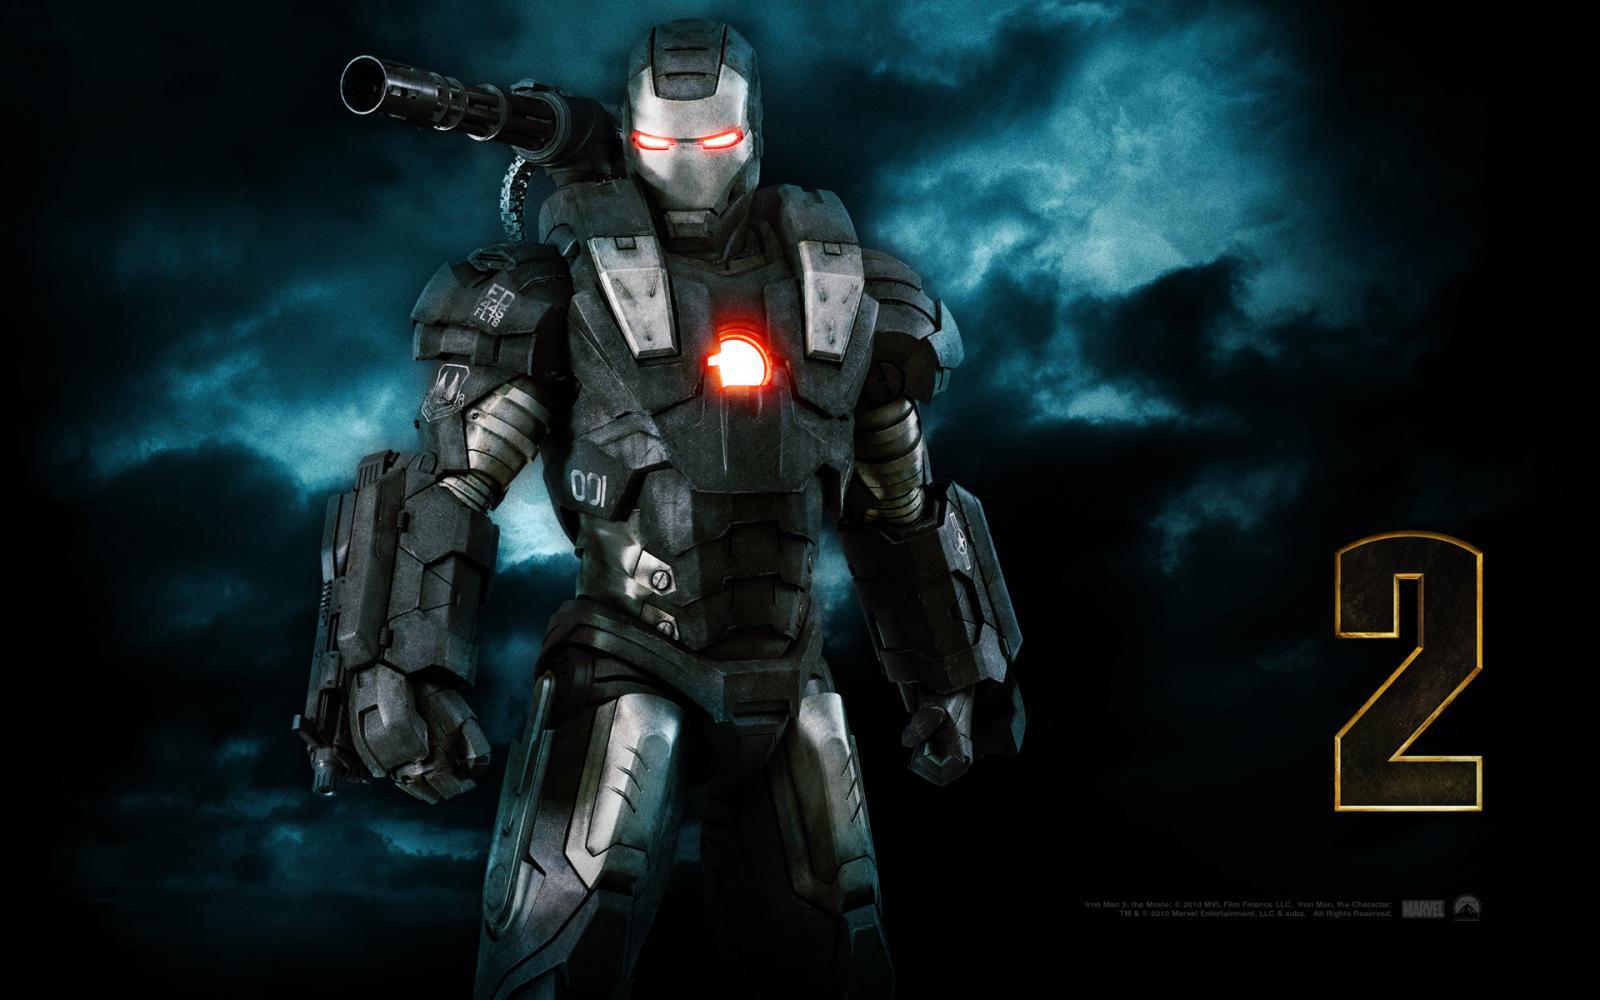 Wallpaper Iron Man 2 lieutenant-colonel James Rhodes Iron Man